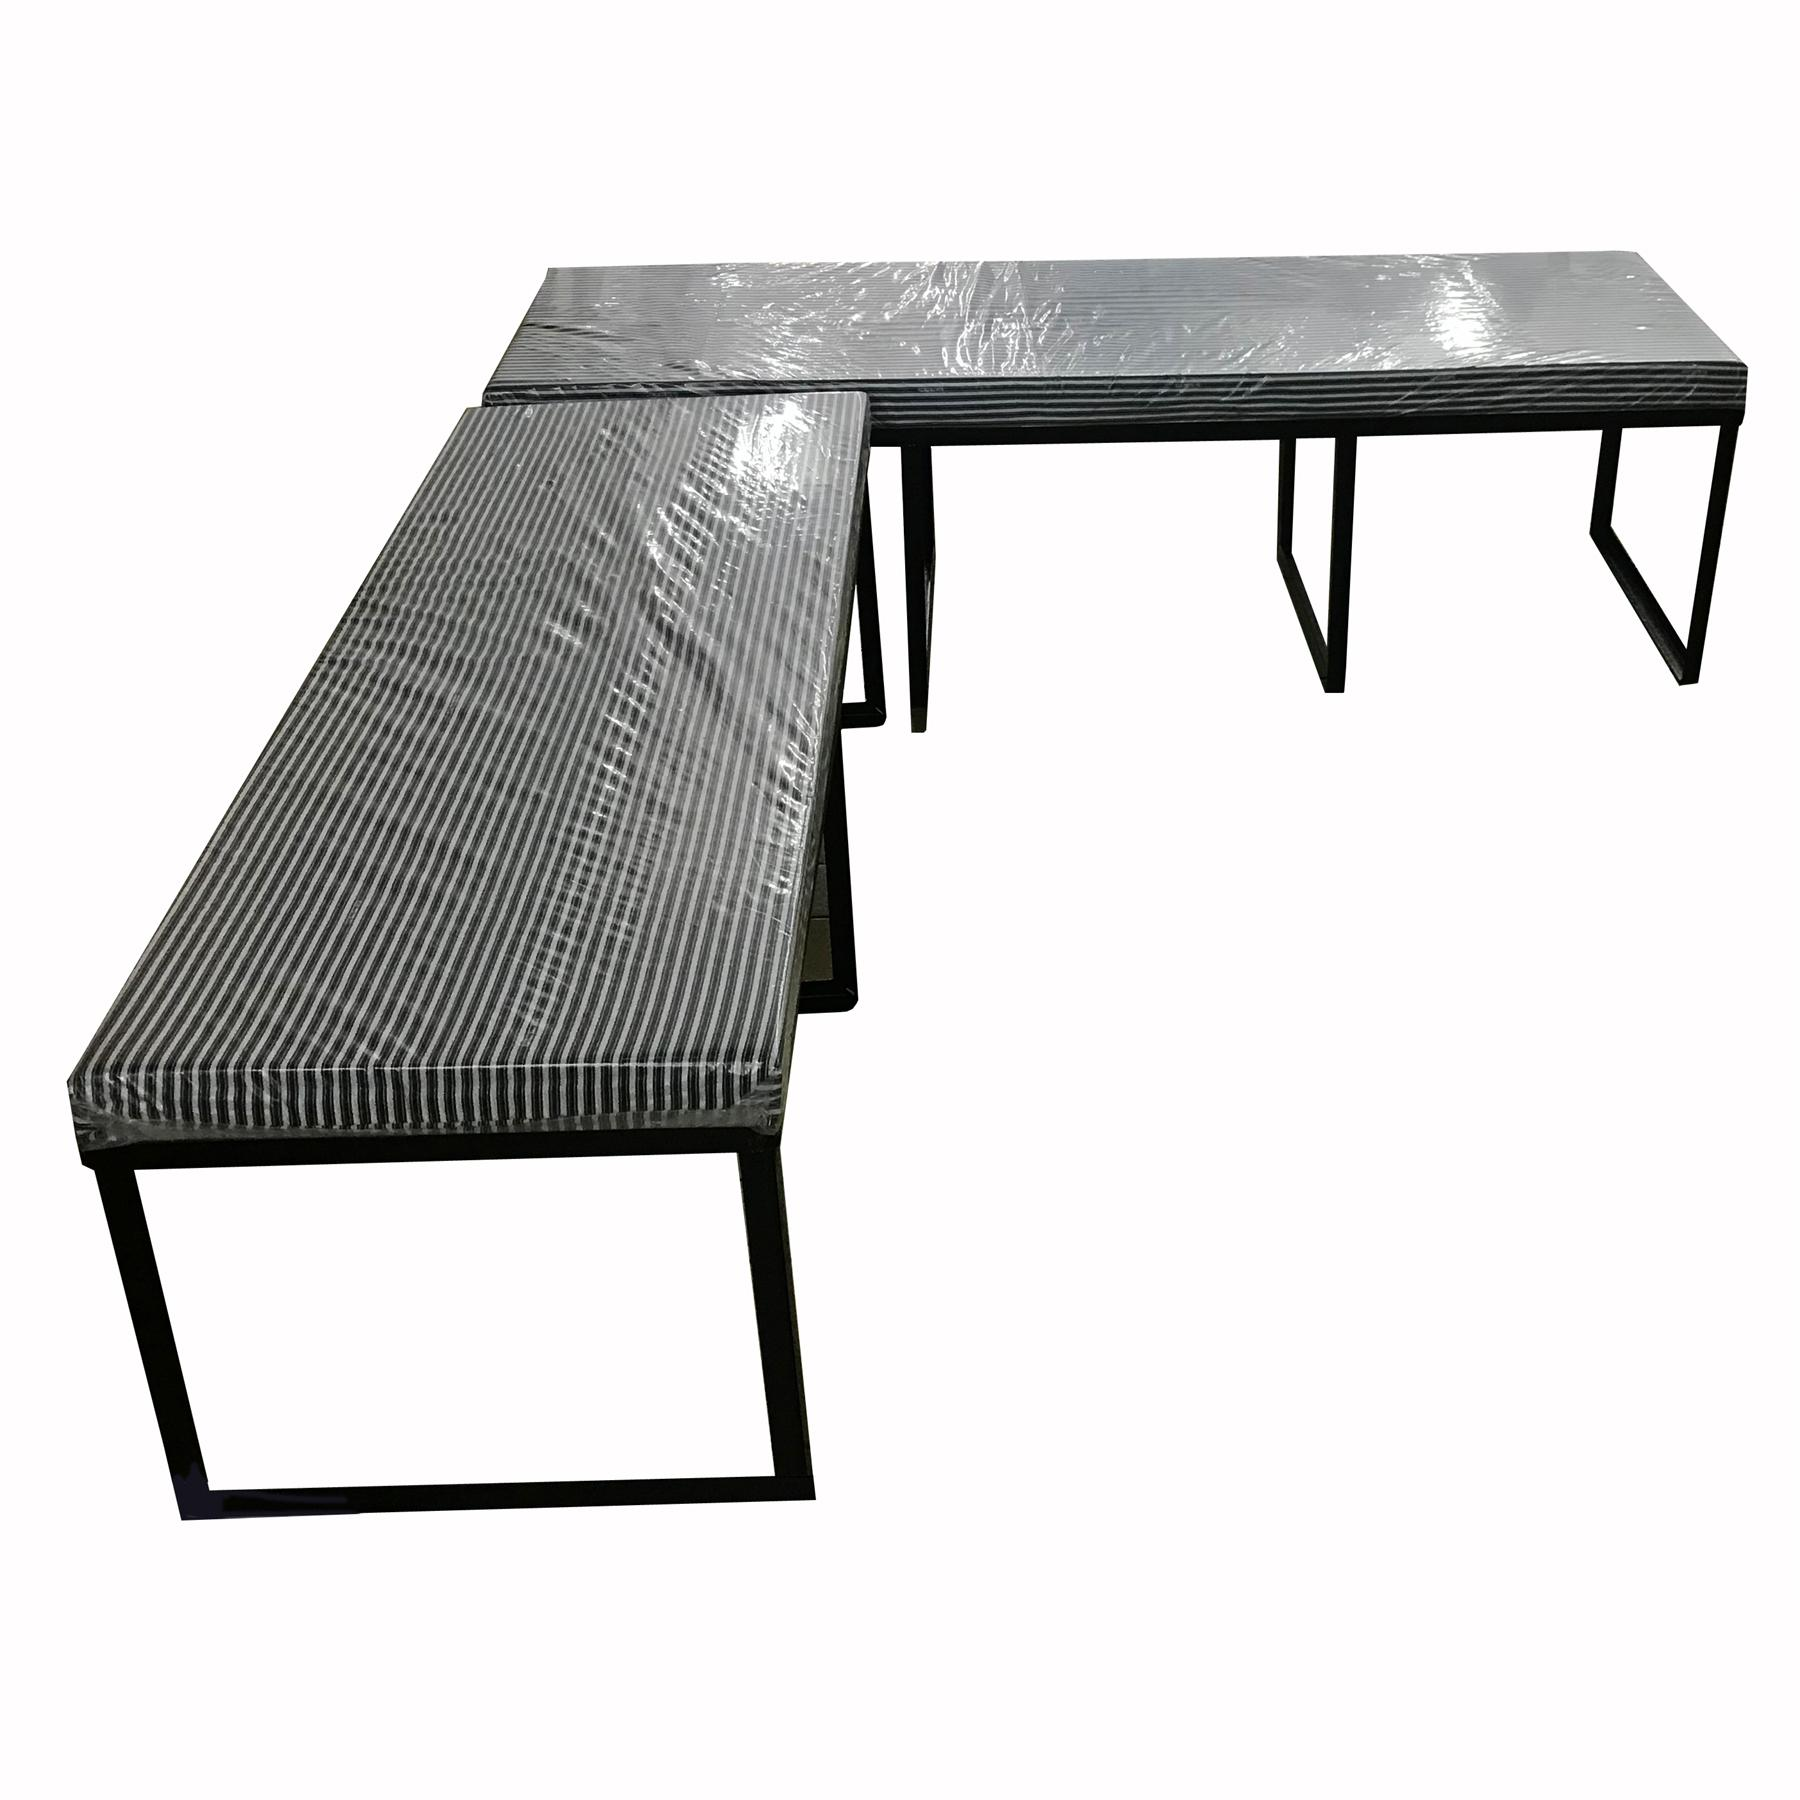 Strange Buy Latest Storage Benches At Best Price Online In Unemploymentrelief Wooden Chair Designs For Living Room Unemploymentrelieforg